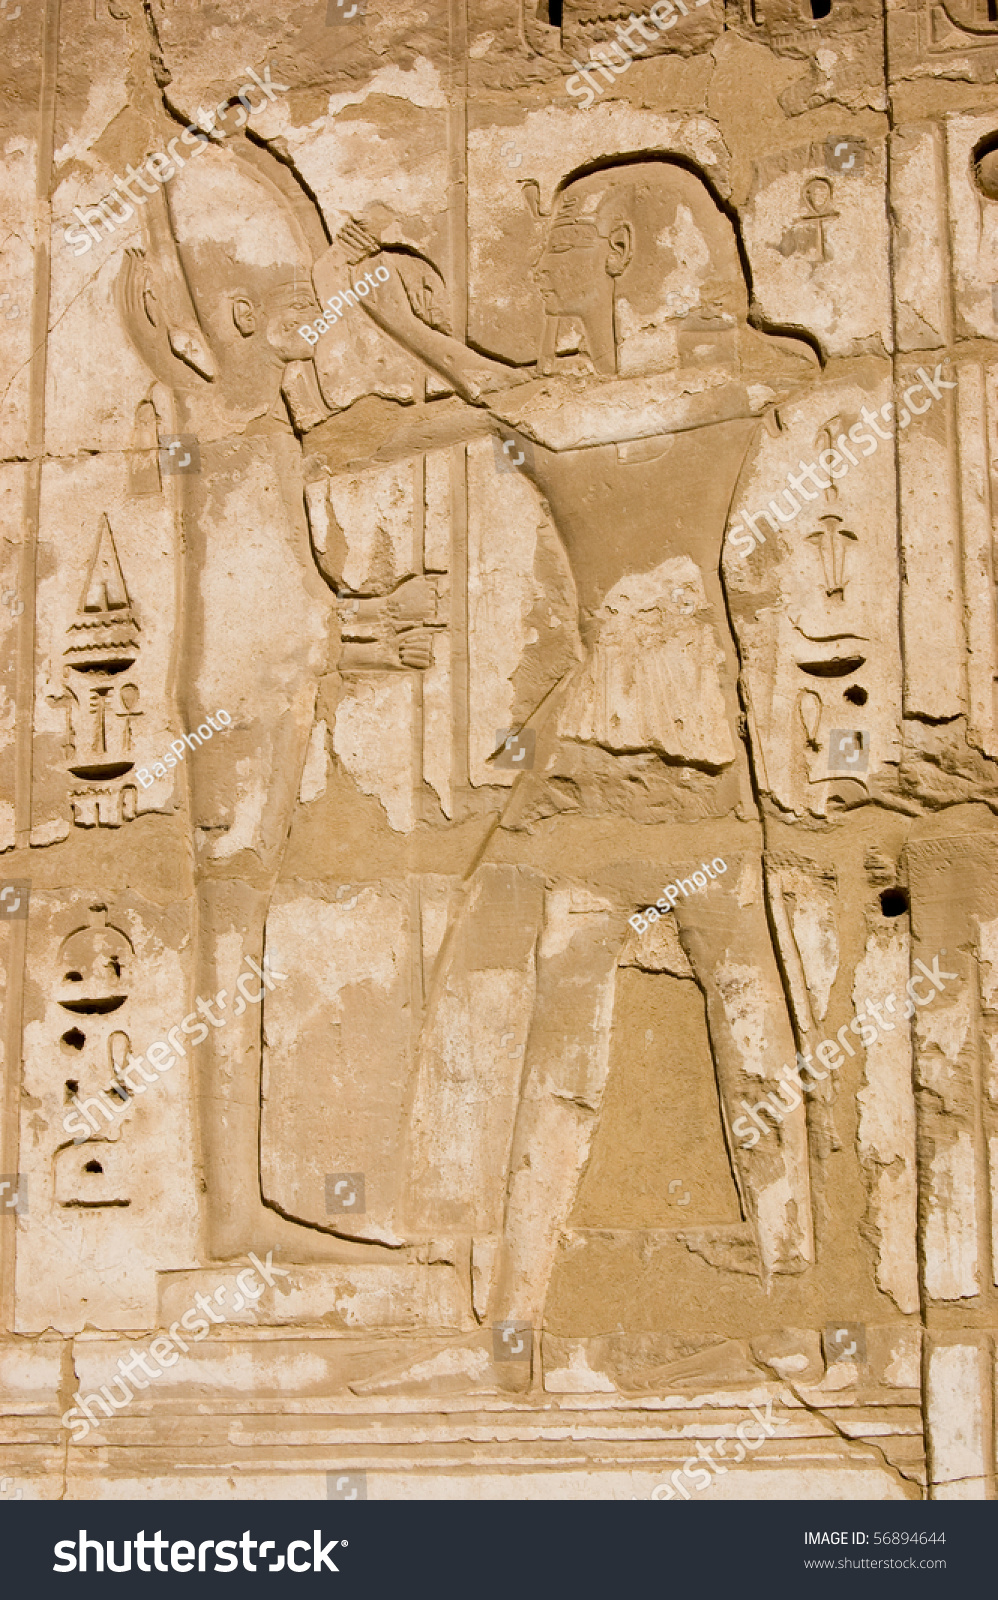 Ancient egyptian hieroglyphic carving ramses ii stock